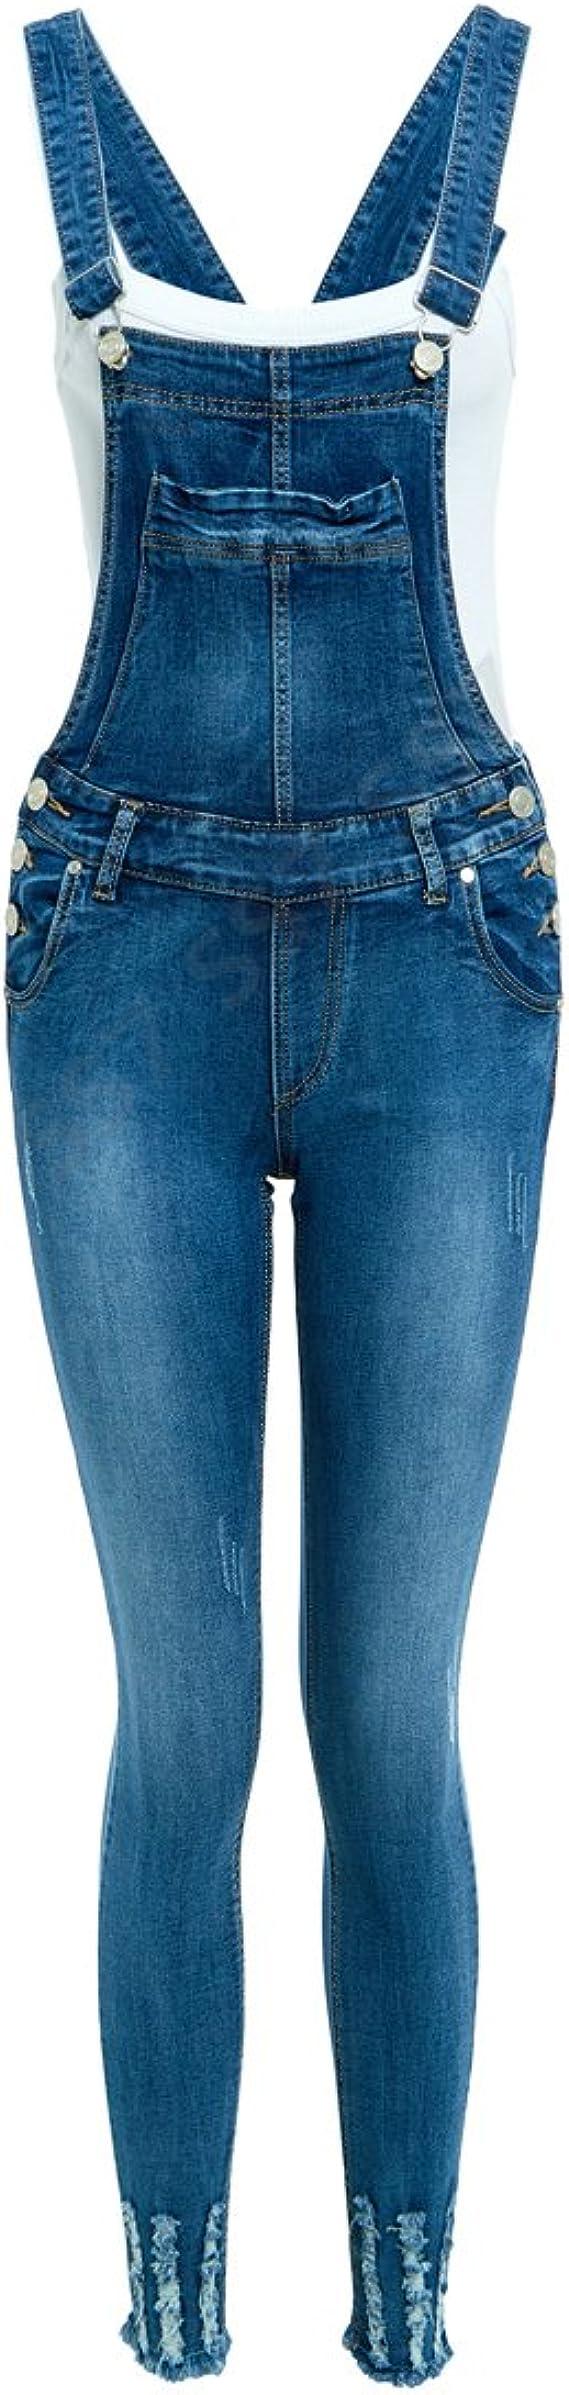 Womens Blue Ripped Skinny Jeans Ladies Slim Fit Denim Size 6 8 10 12 14 16 18 20